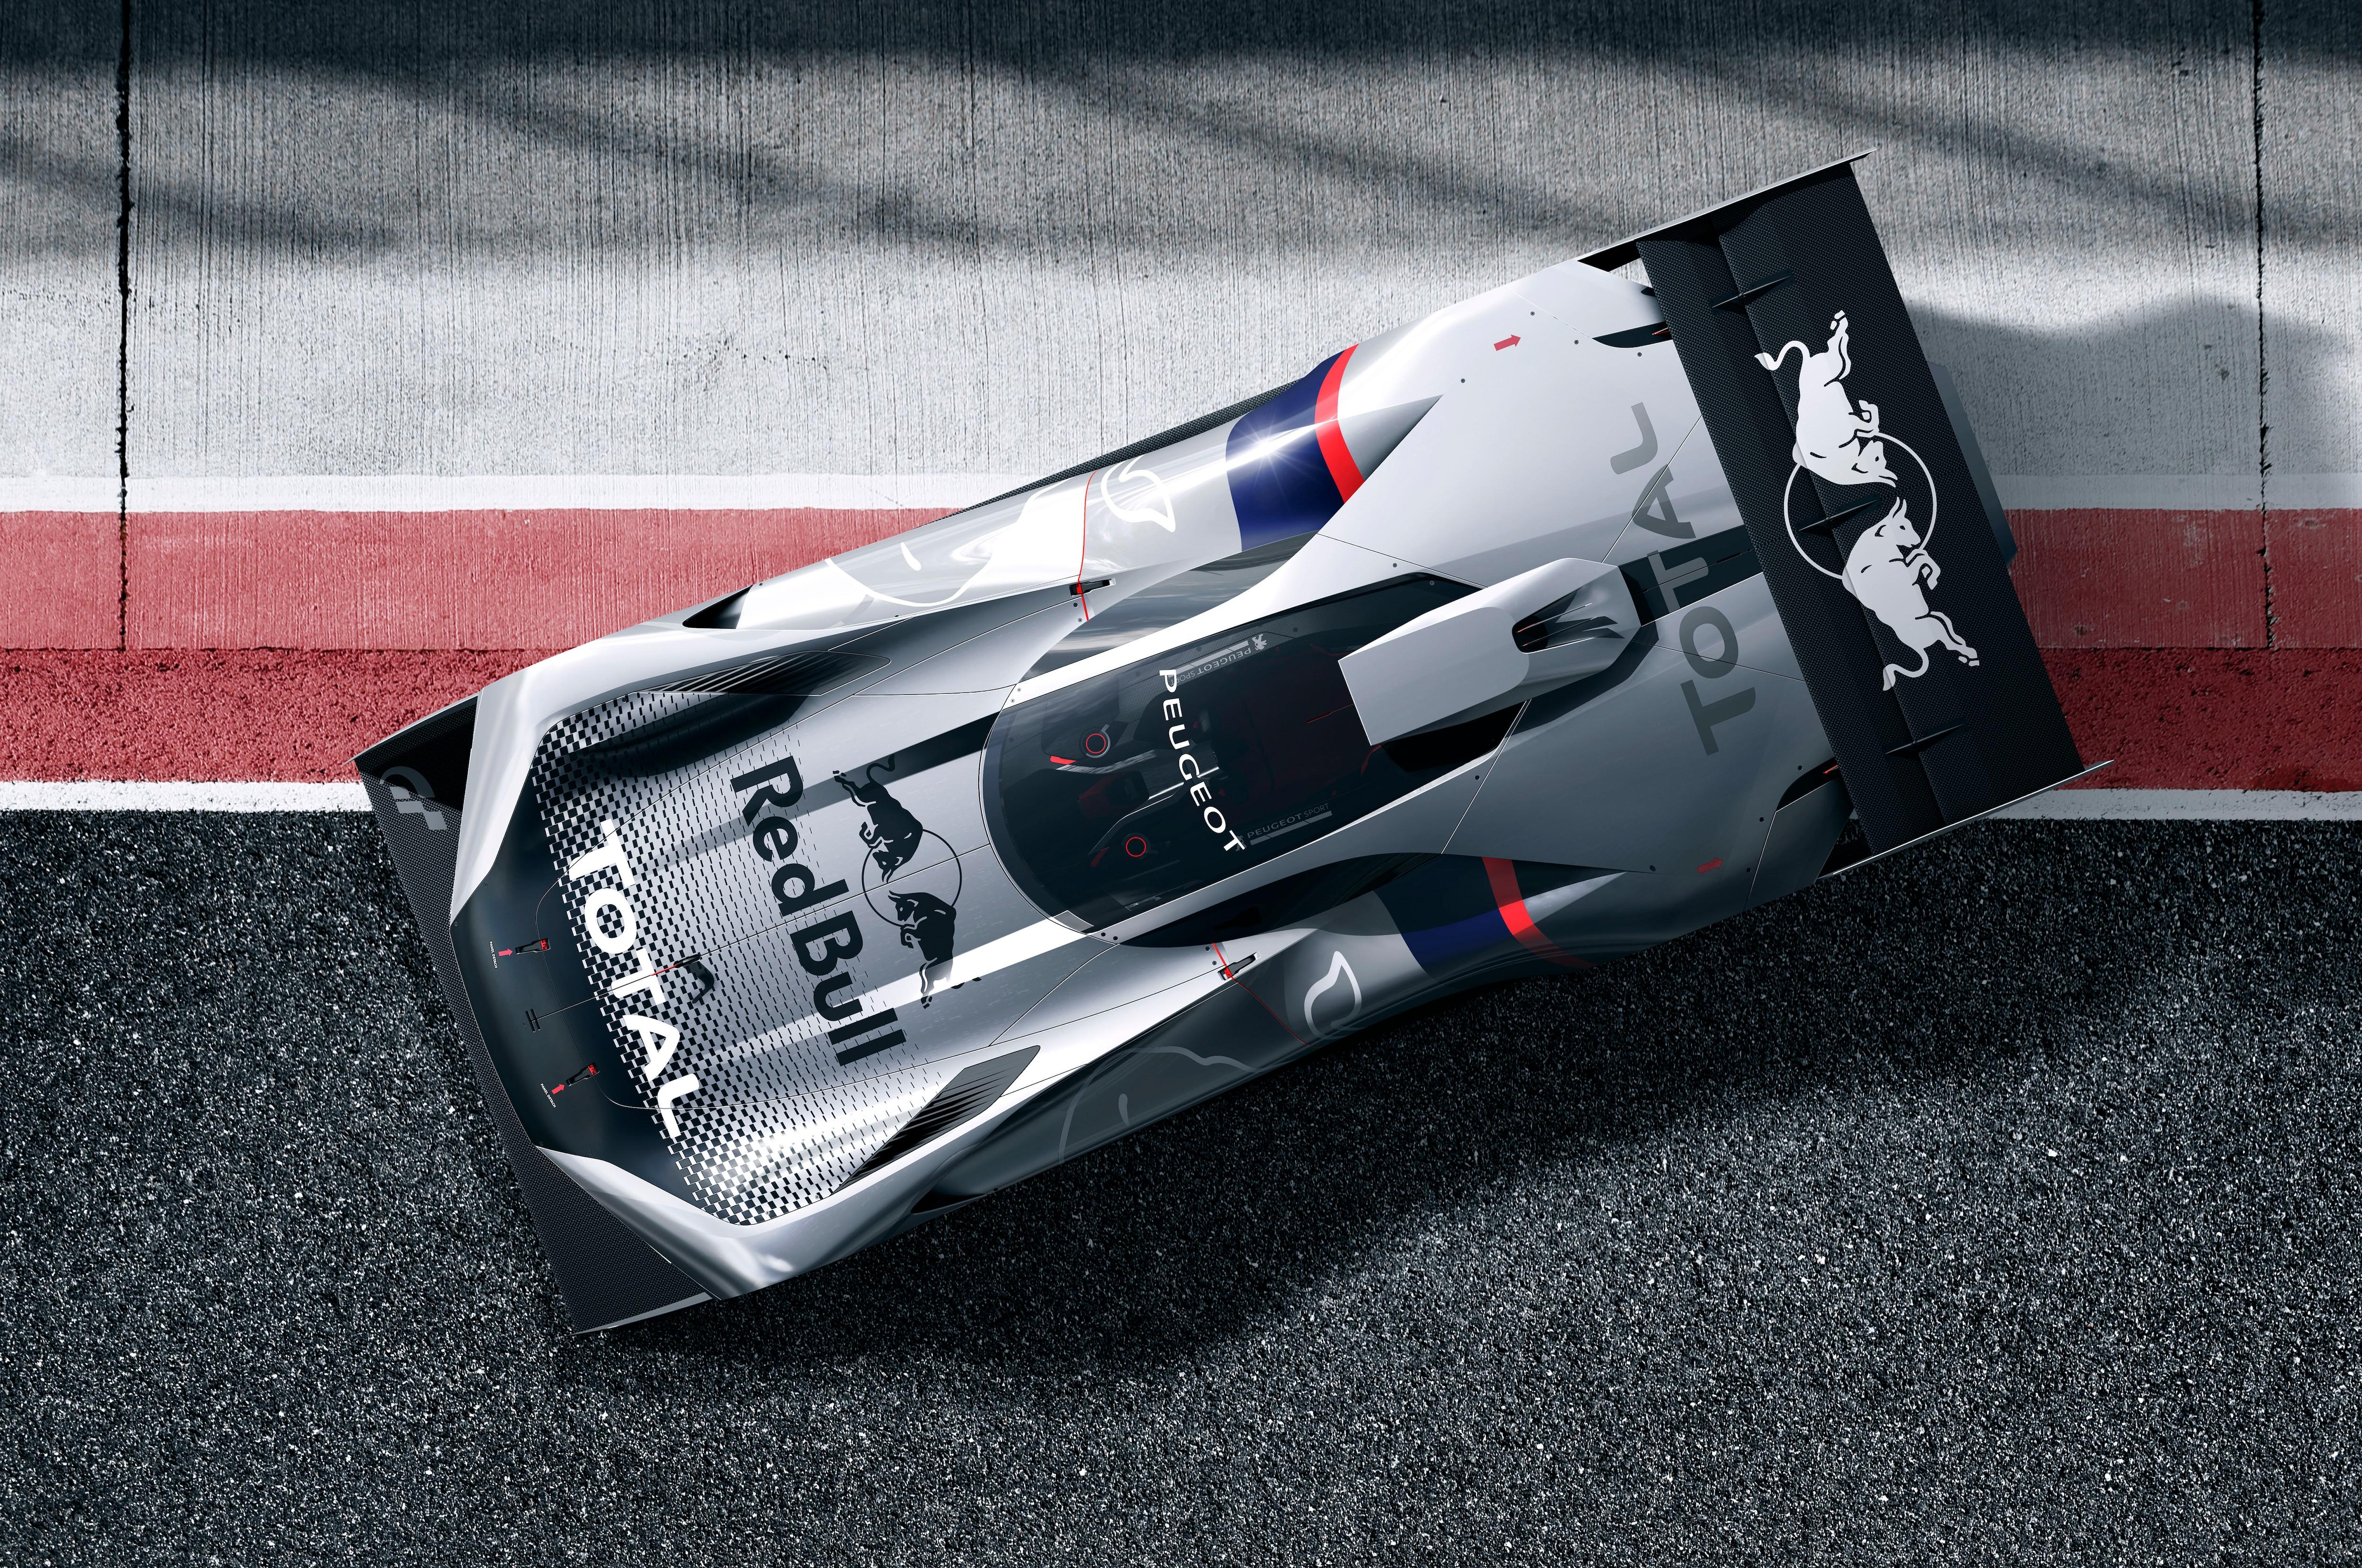 Image [ 27 of 49 ] - Peugeot L750 R Hybrid Vision Gran Turismo 4k 7 ...